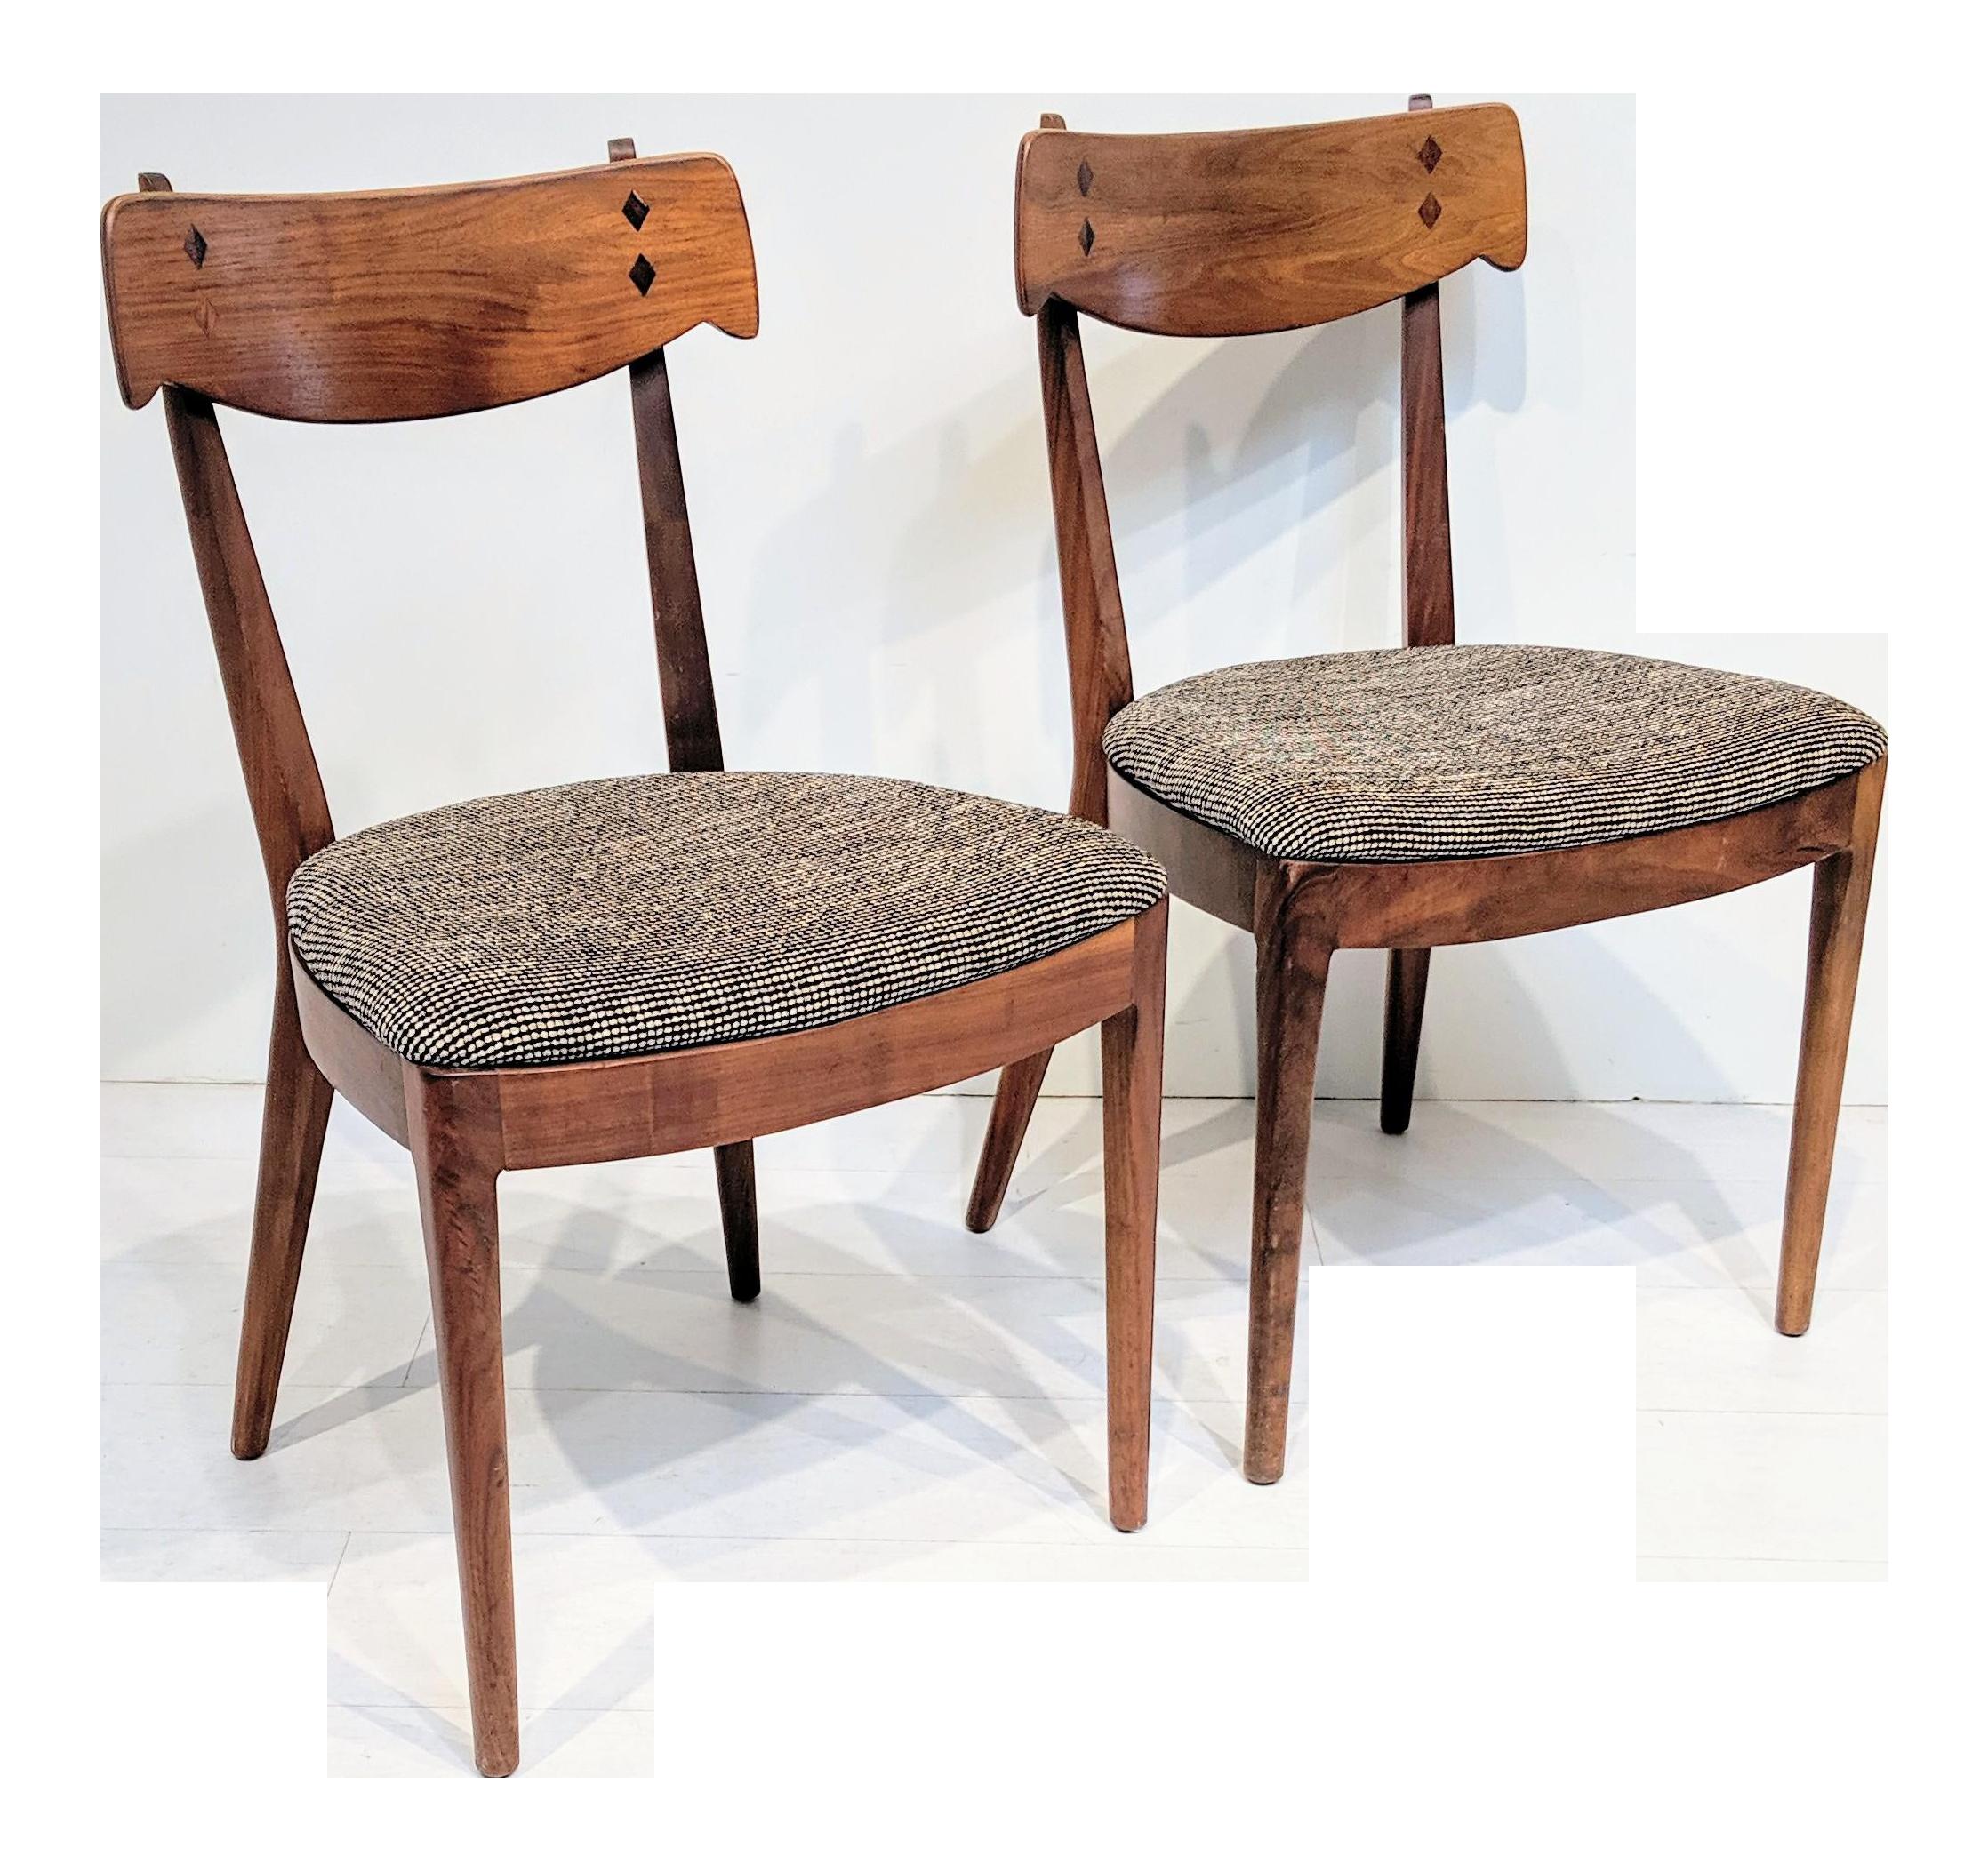 Peachy Mid Century Modern Kipp Stewart For Drexel Dining Chairs A Pair Dailytribune Chair Design For Home Dailytribuneorg